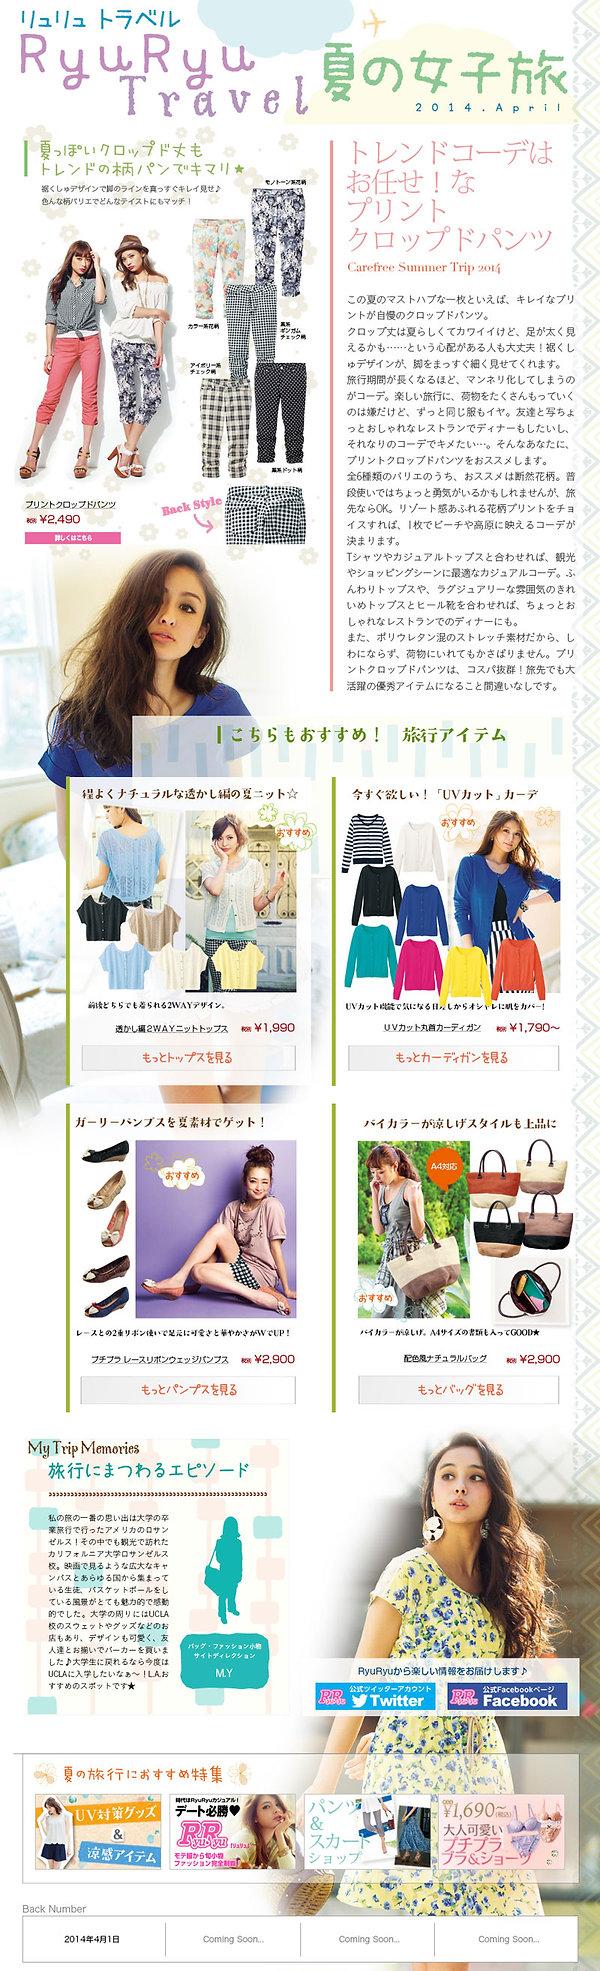 14su_ryuryu_travel.jpg